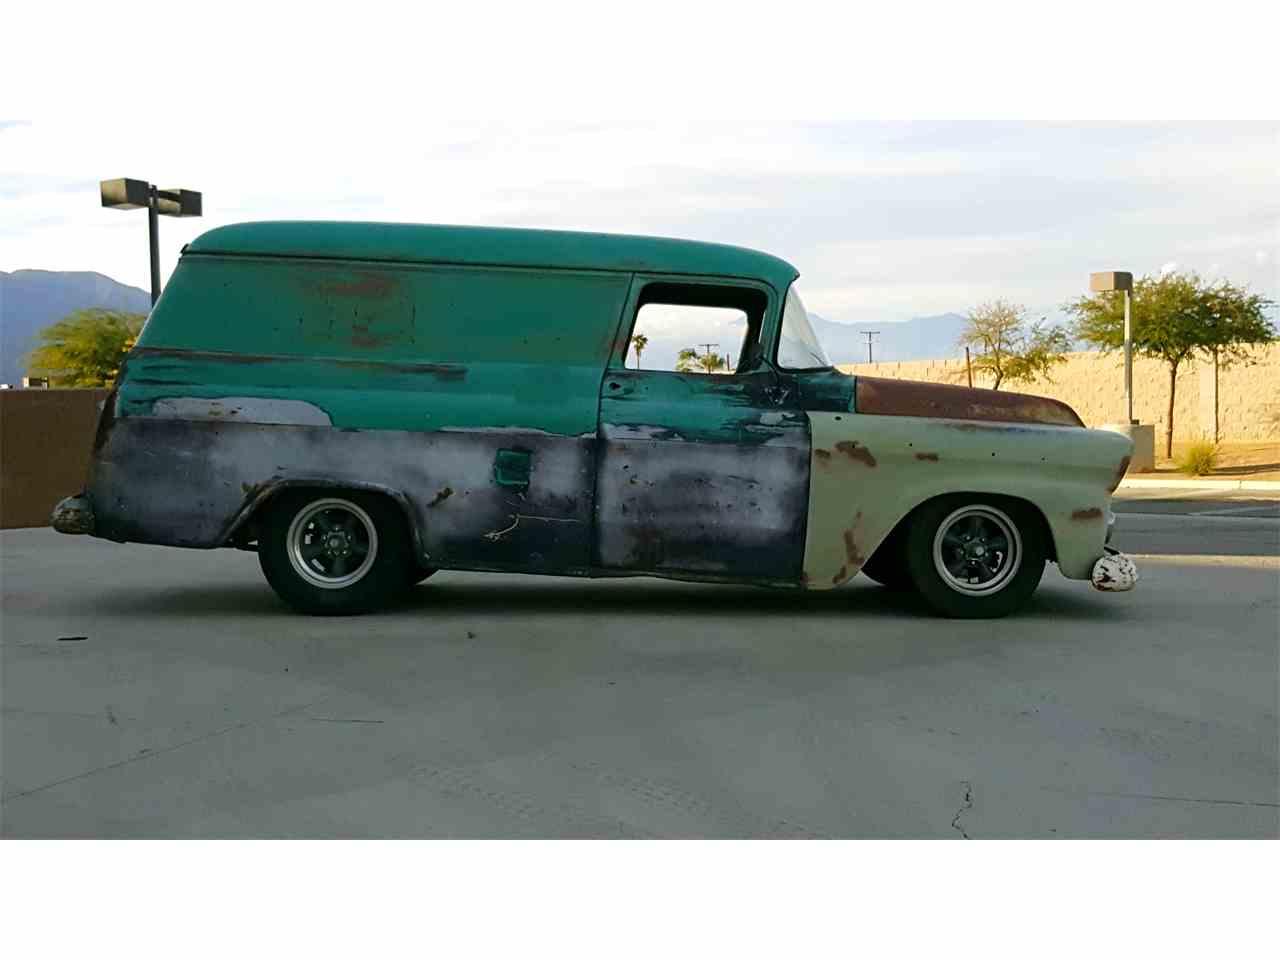 1957 chevrolet panel truck for sale cc 753027. Black Bedroom Furniture Sets. Home Design Ideas